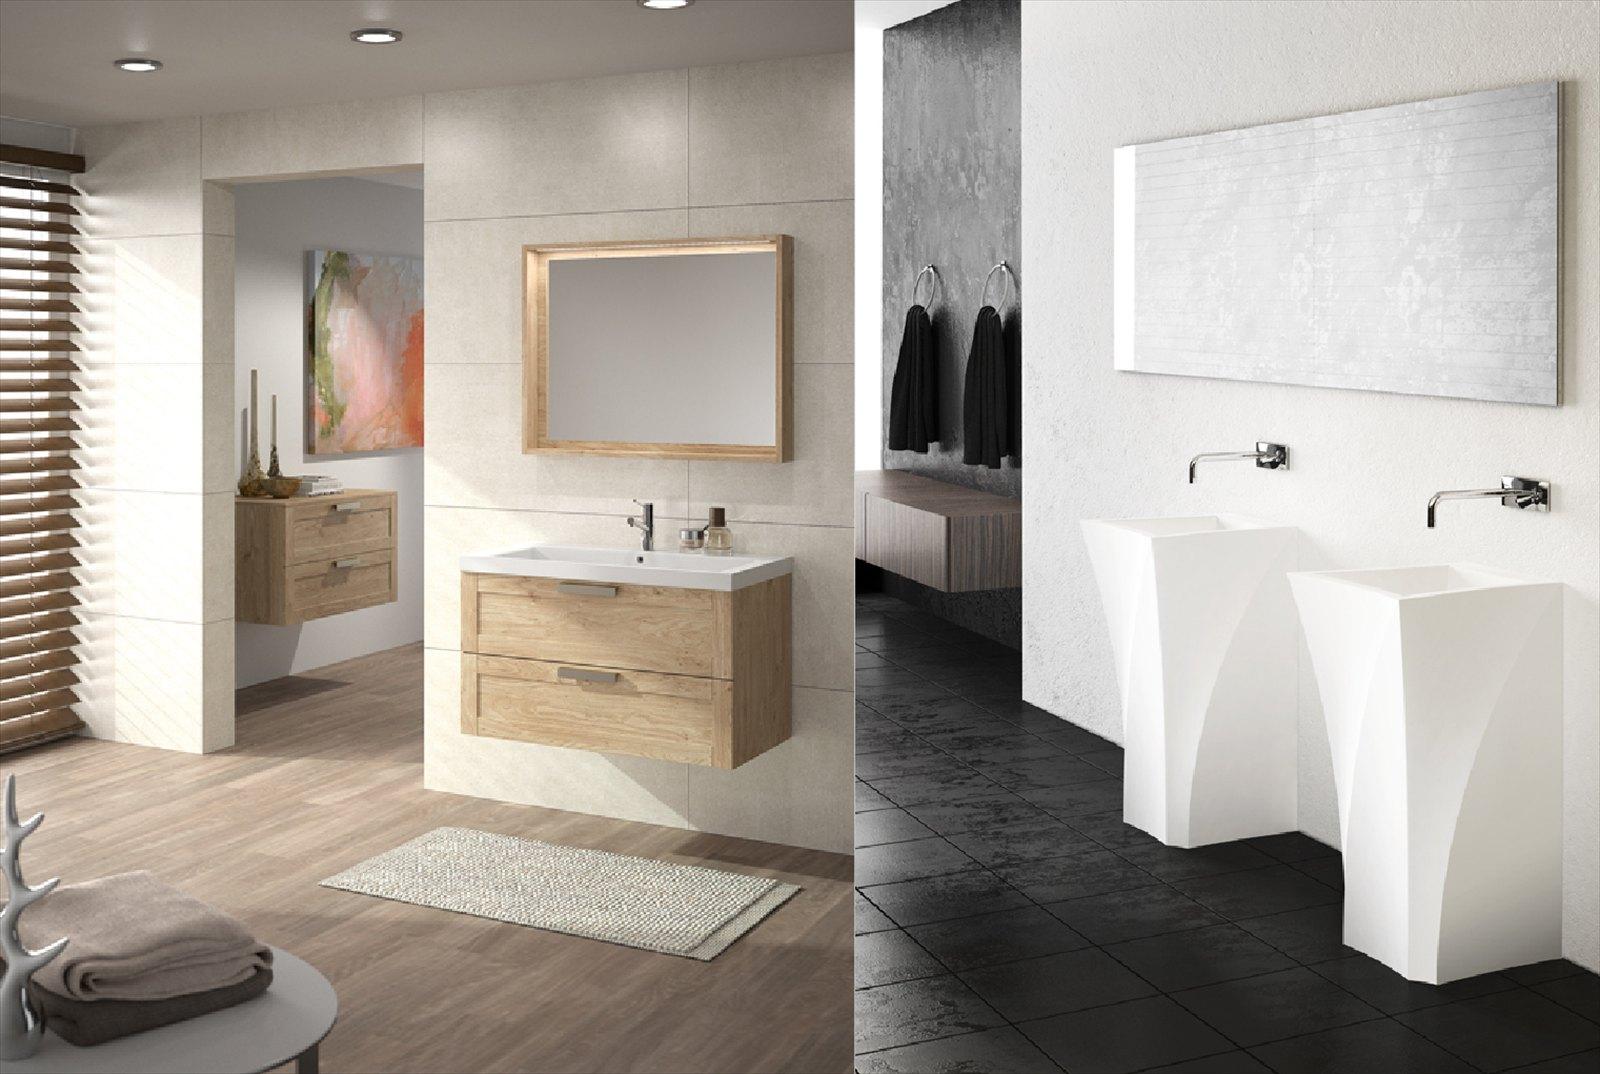 Salle De Bain Montpellier meubles de salle de bains - montpellier - mobile